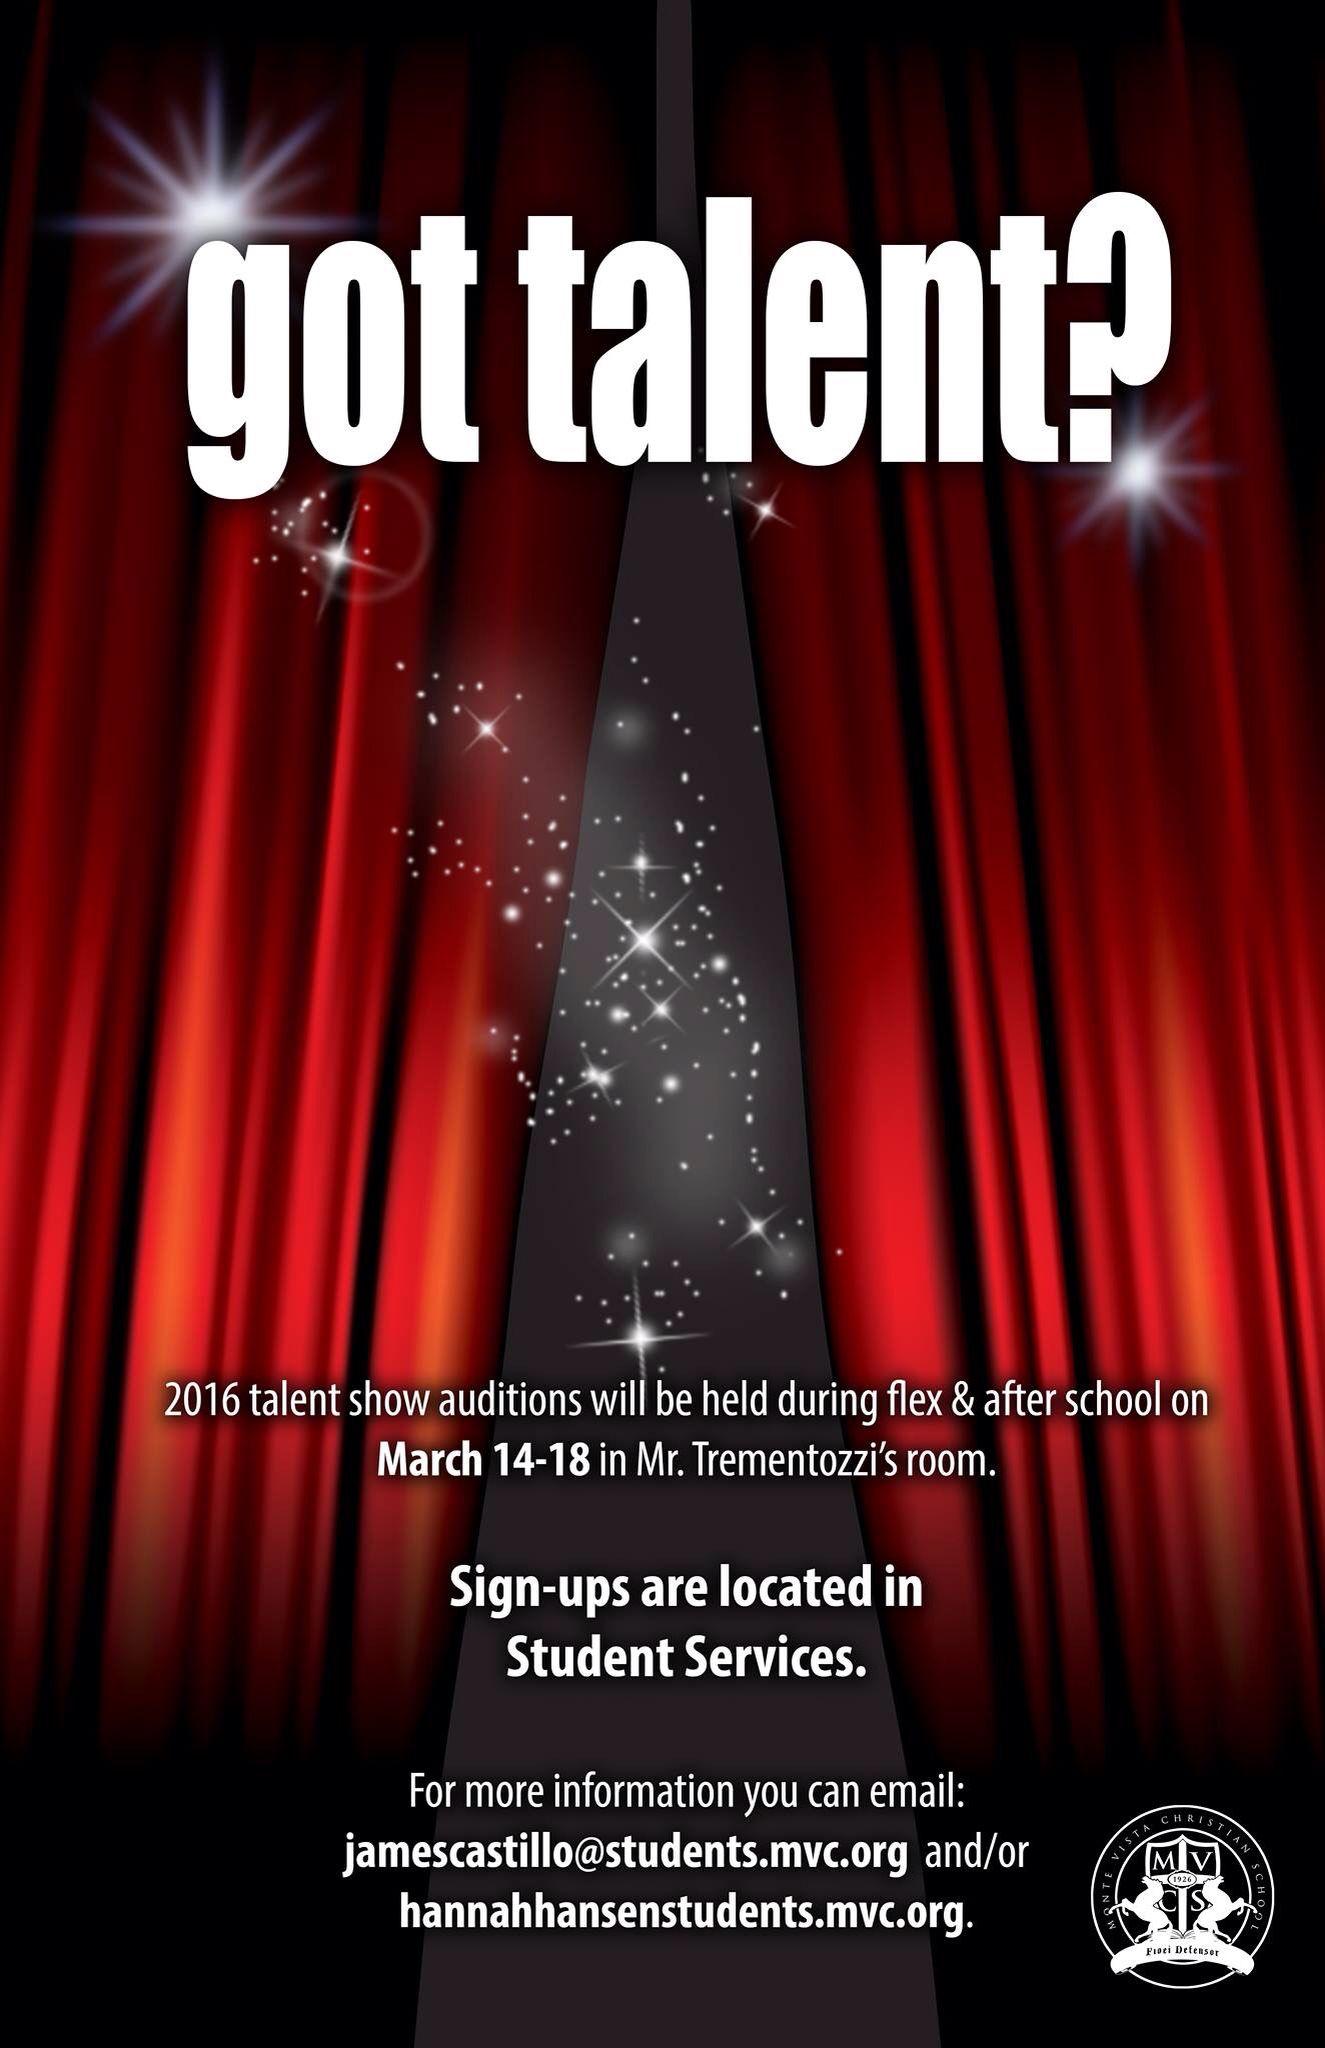 Mvcs Talent Show Flyer Template Talent Show Poster Template Free talent show flyer template